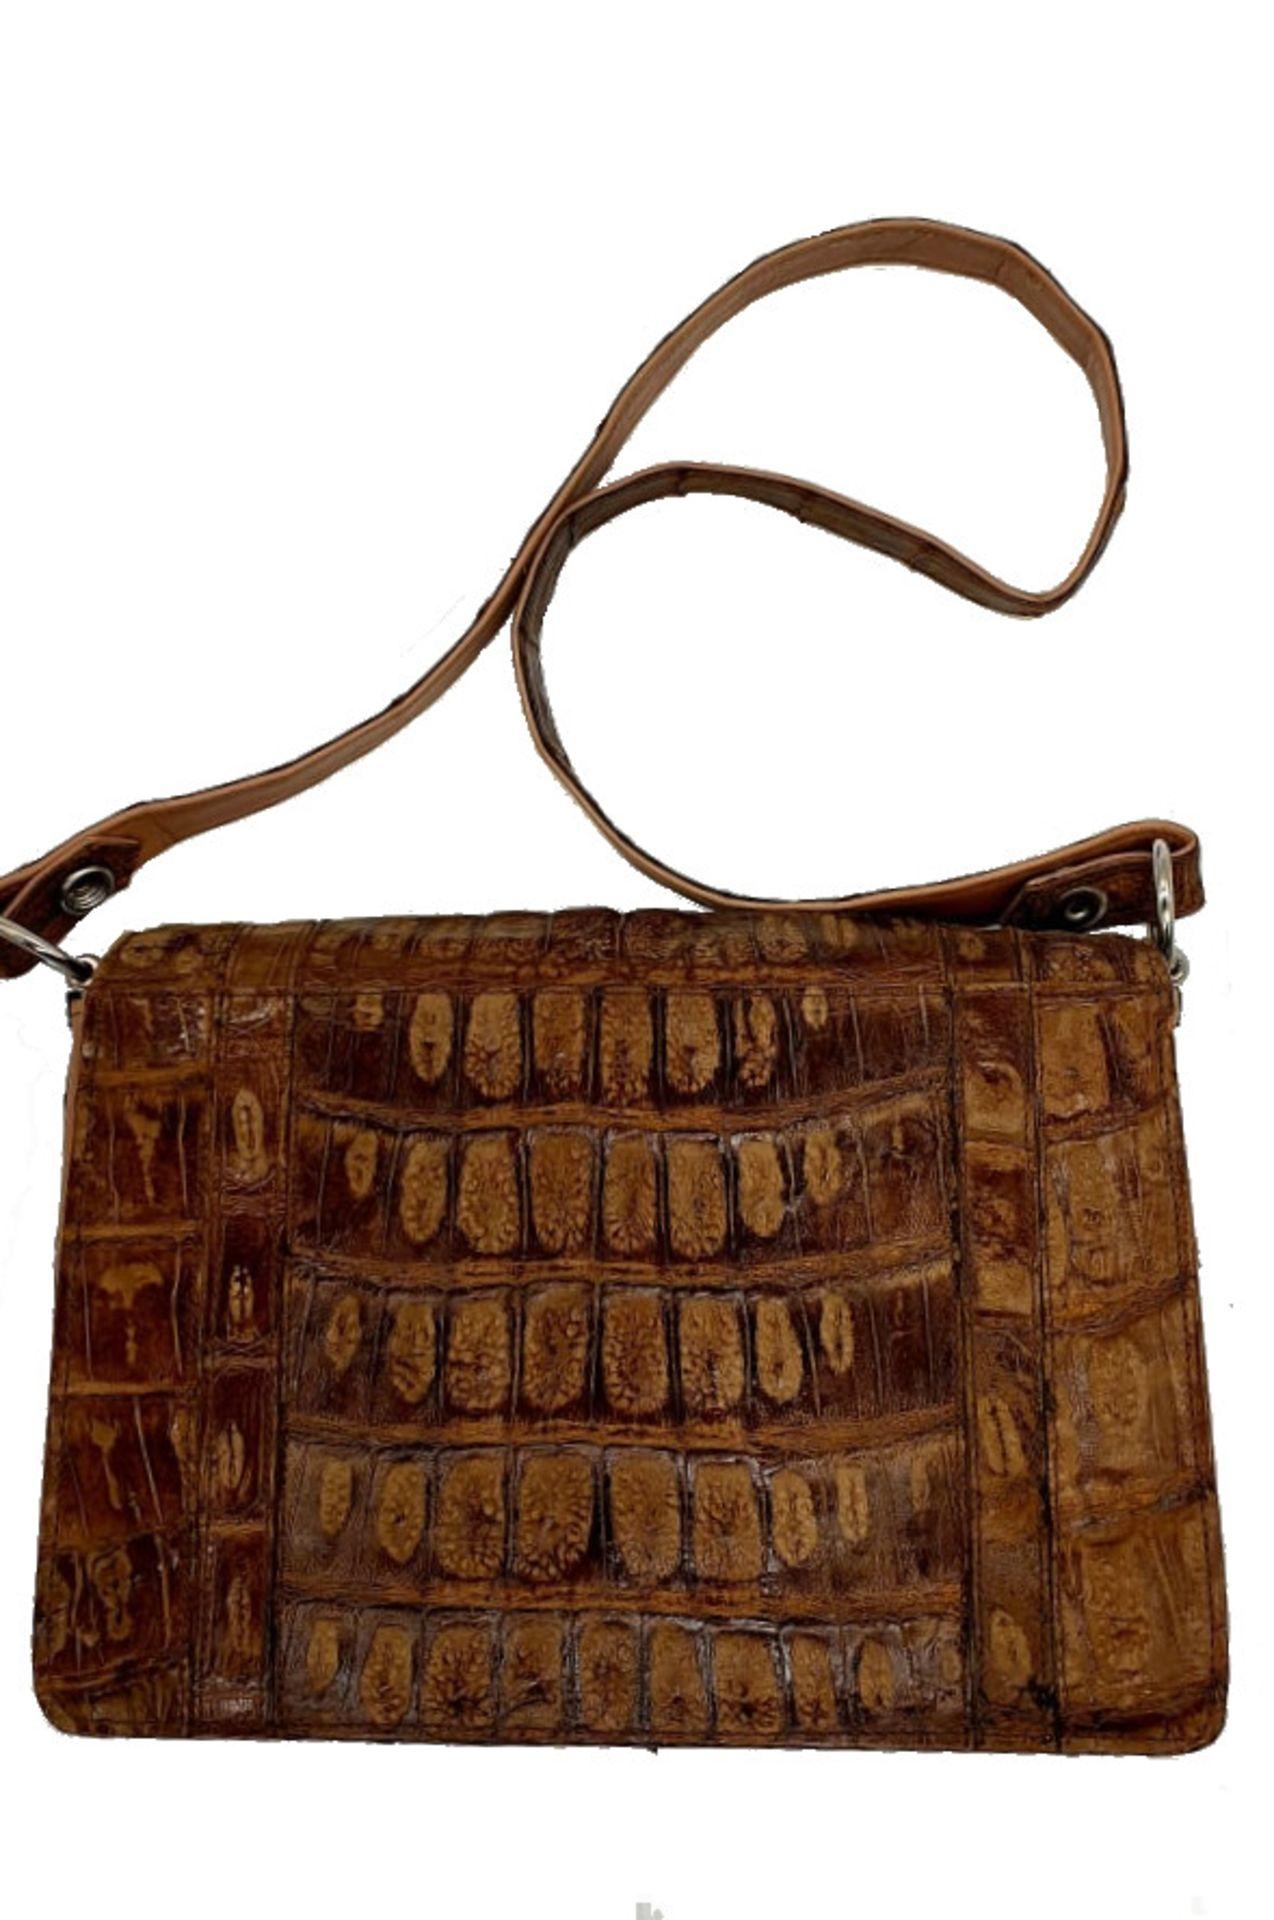 Brown Croco Handbag - Bild 6 aus 8